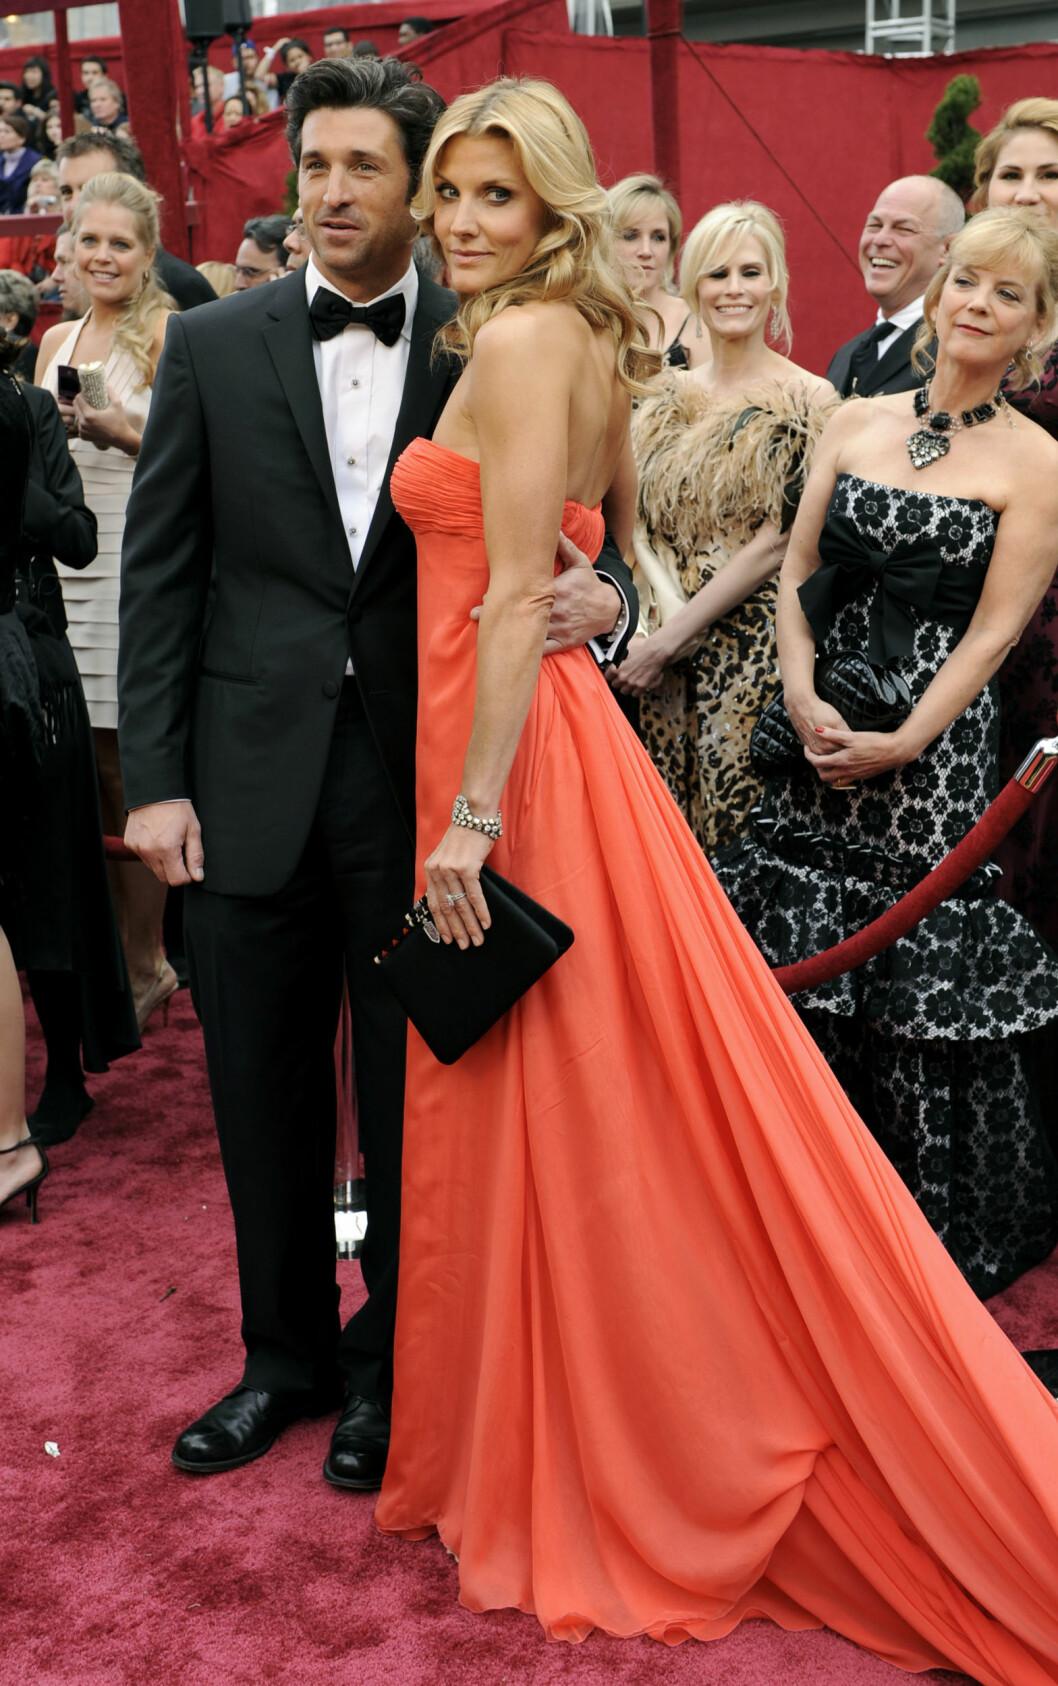 FANT TILBAKE TIL HVERANDRE: Her er paret under Oscar utdelingen i Los Angeles for åtte år siden.  Foto: NTB Scanpix